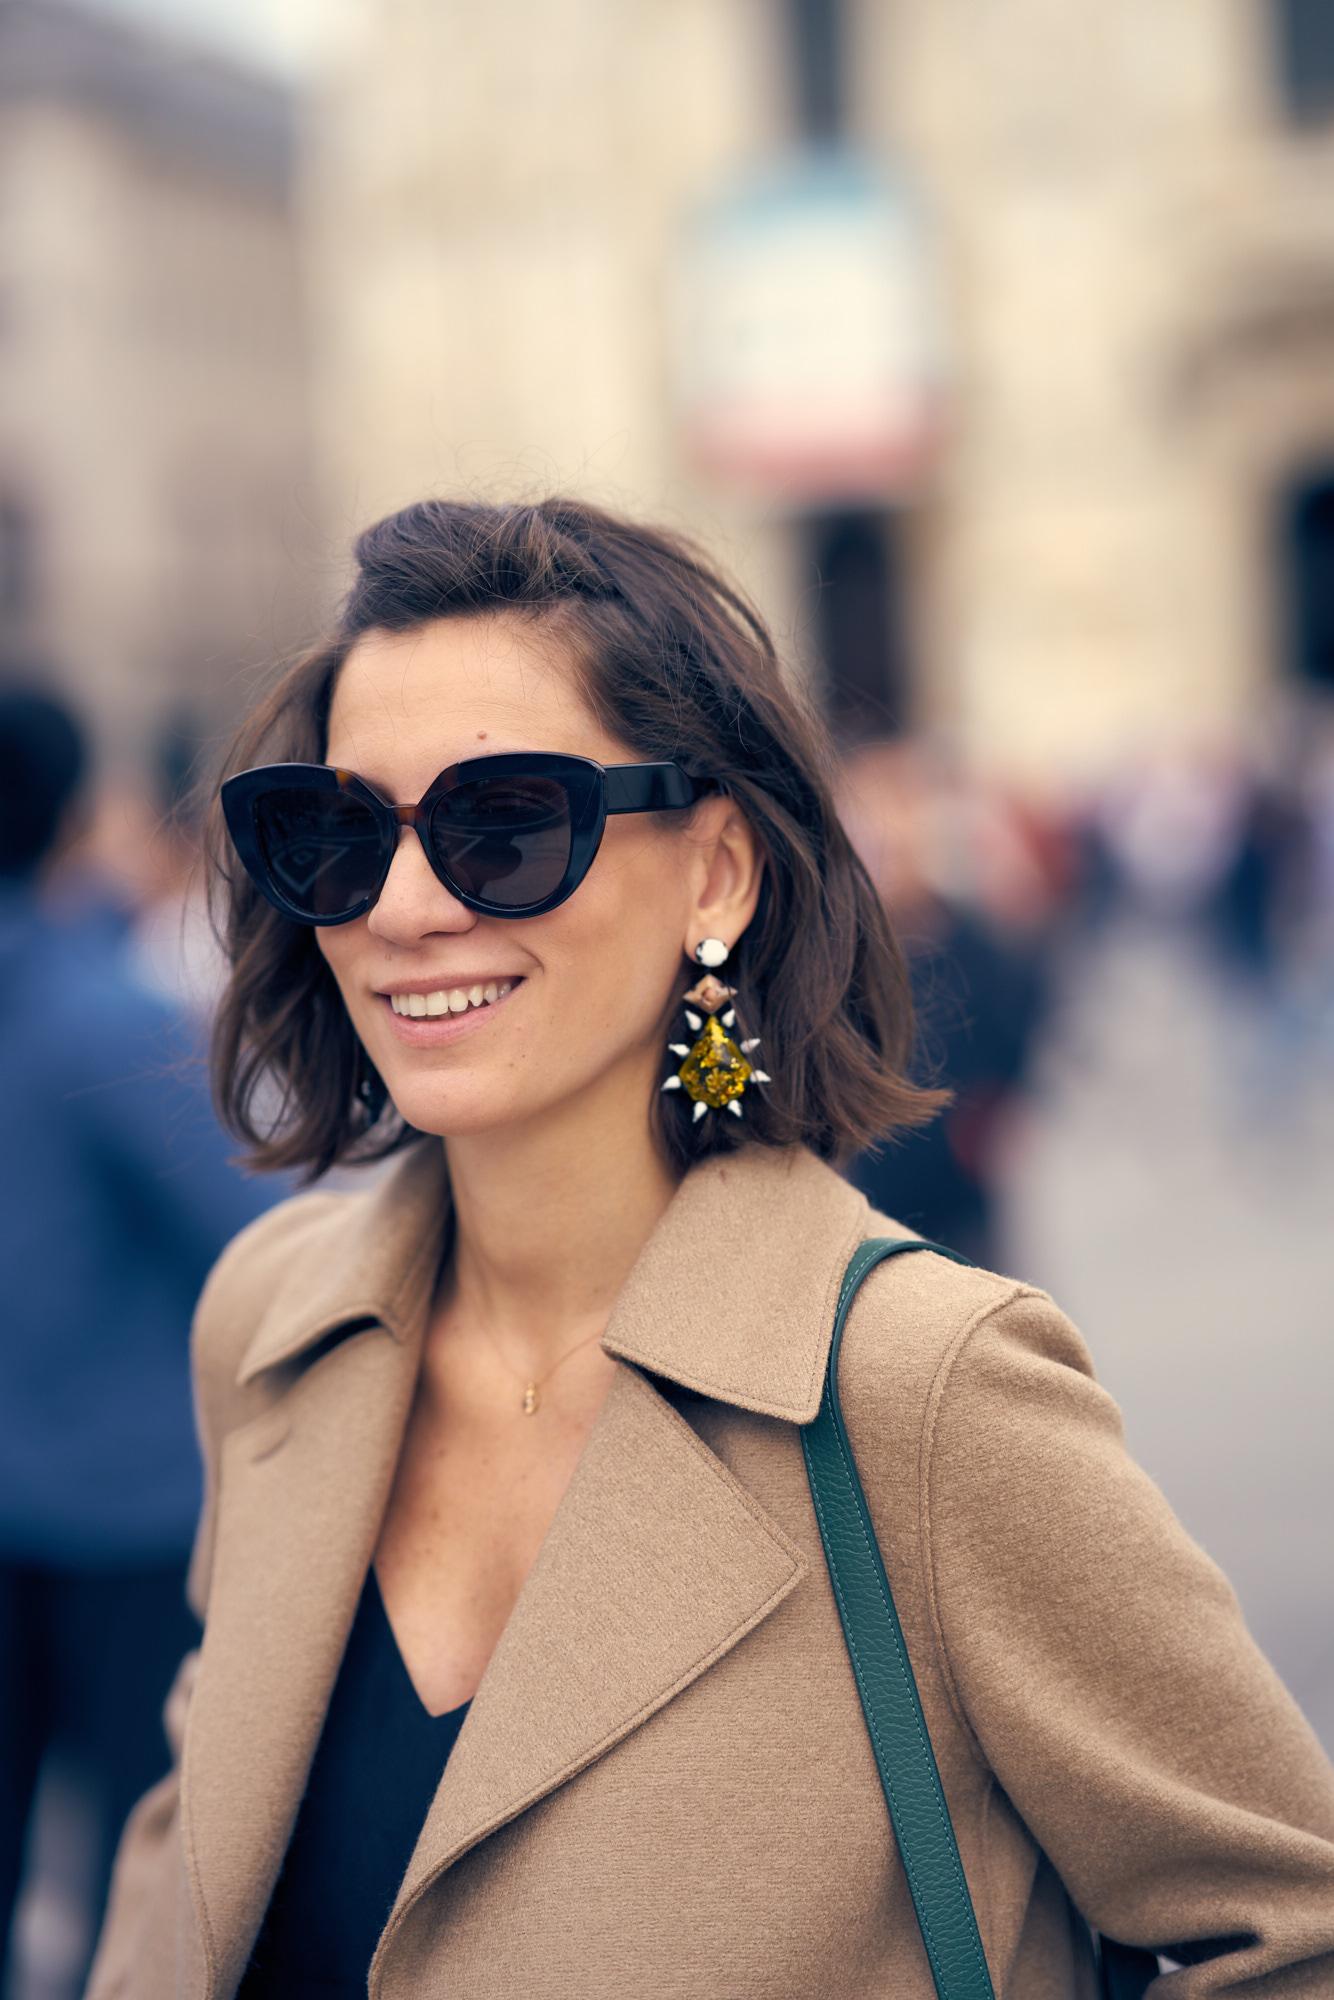 billur saatci, offnegiysem, street style, turkish style blogger, zara, harris wharf london, aigner, marni, milano, billurmilandiary ,